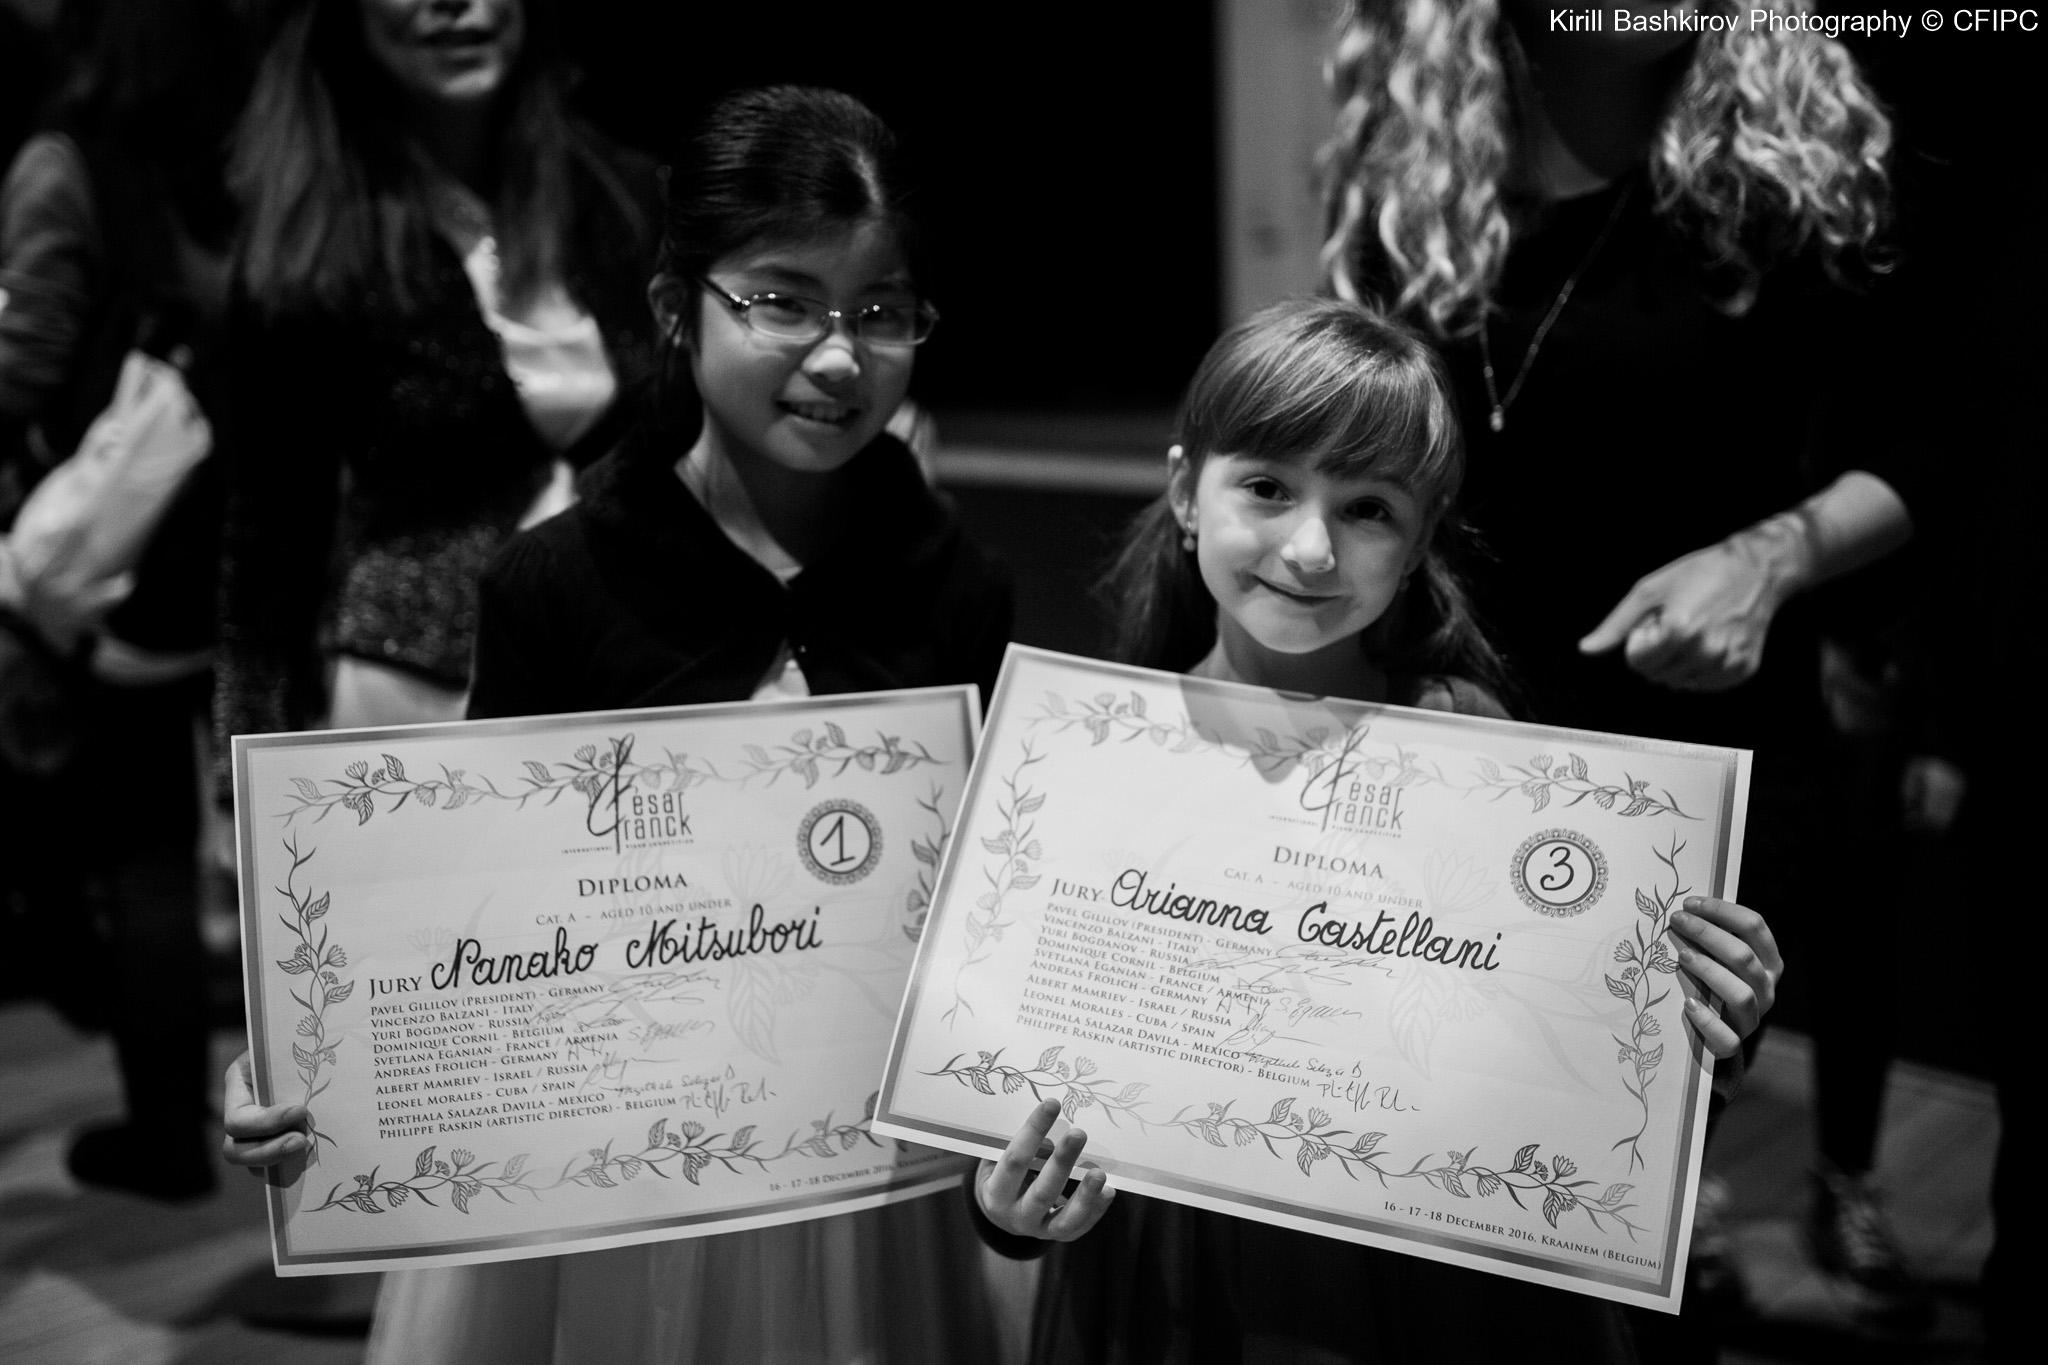 Nanako MITSUBORI (Japan) & Arianna Castellani (Italy)